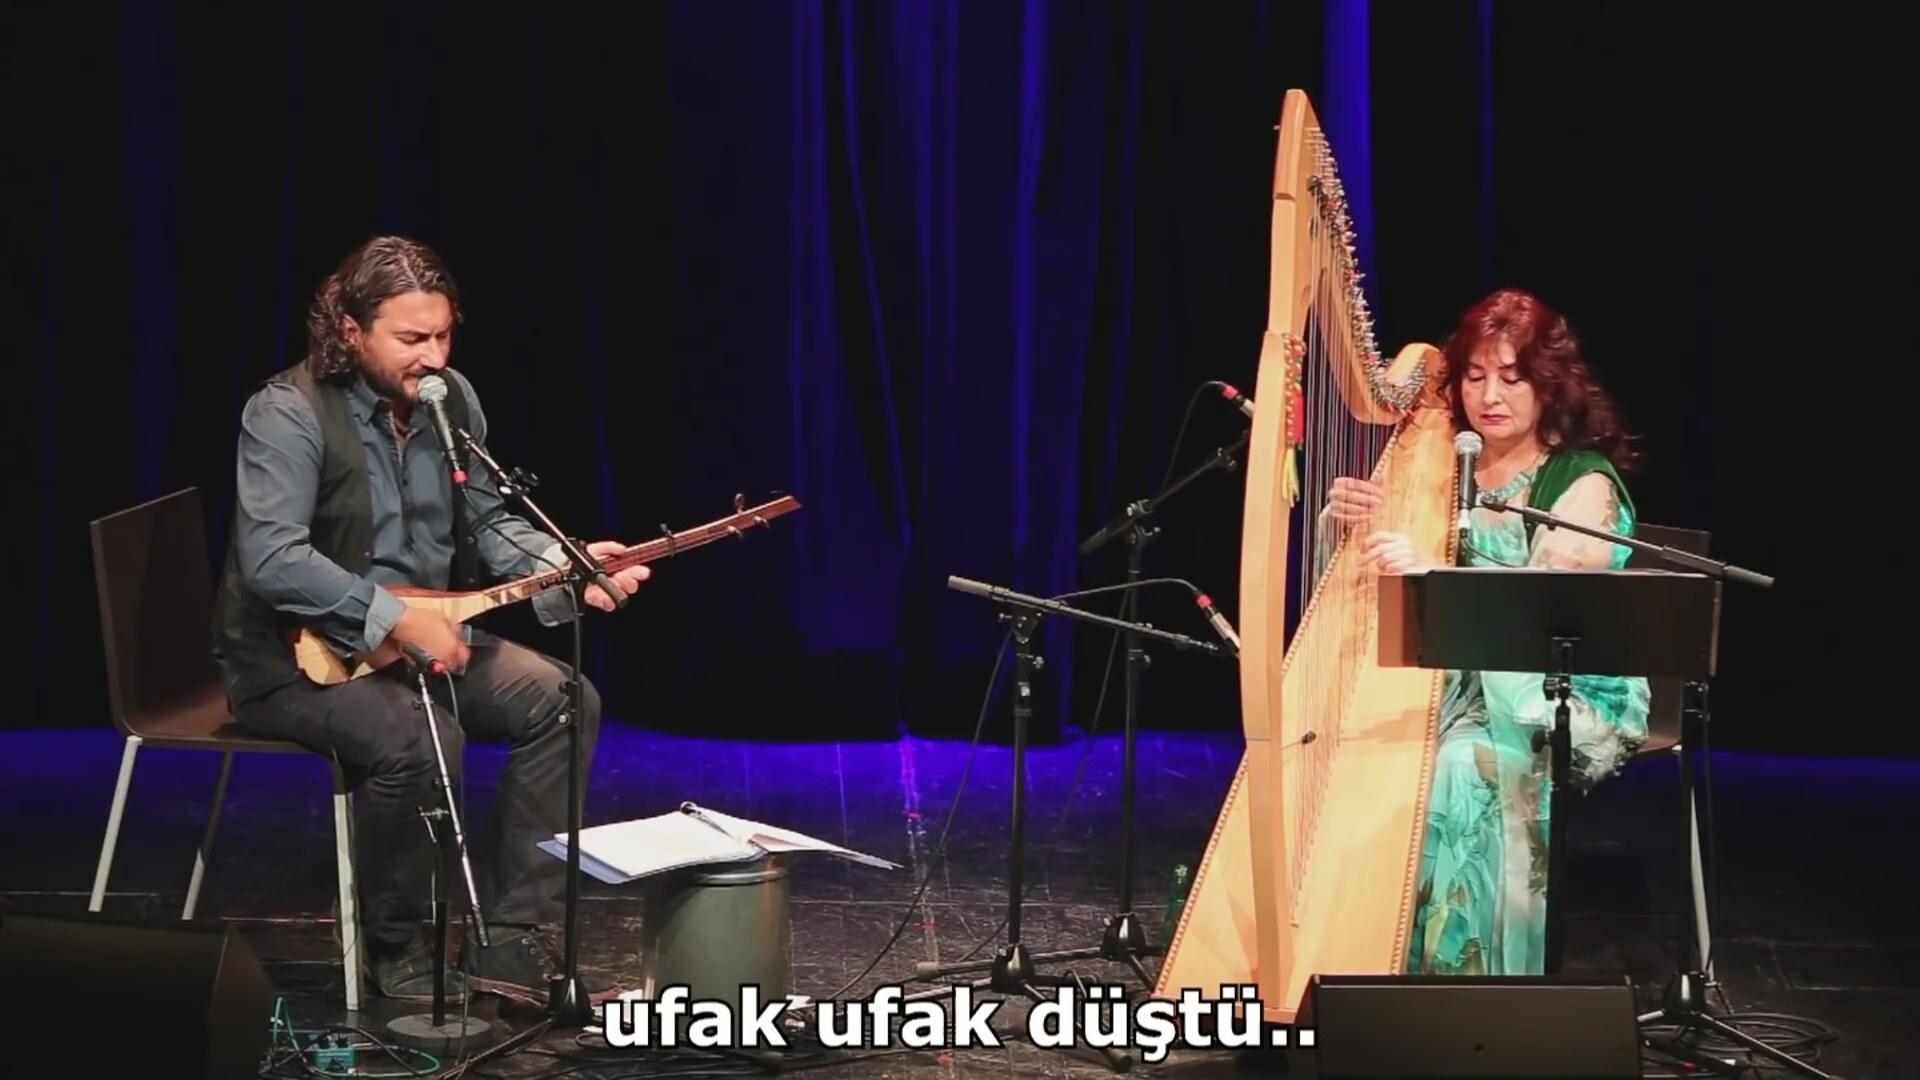 Cemîl Qoçgirî Tara Jaff Baran Barî Türkçe Altyazılı Izlesenecom